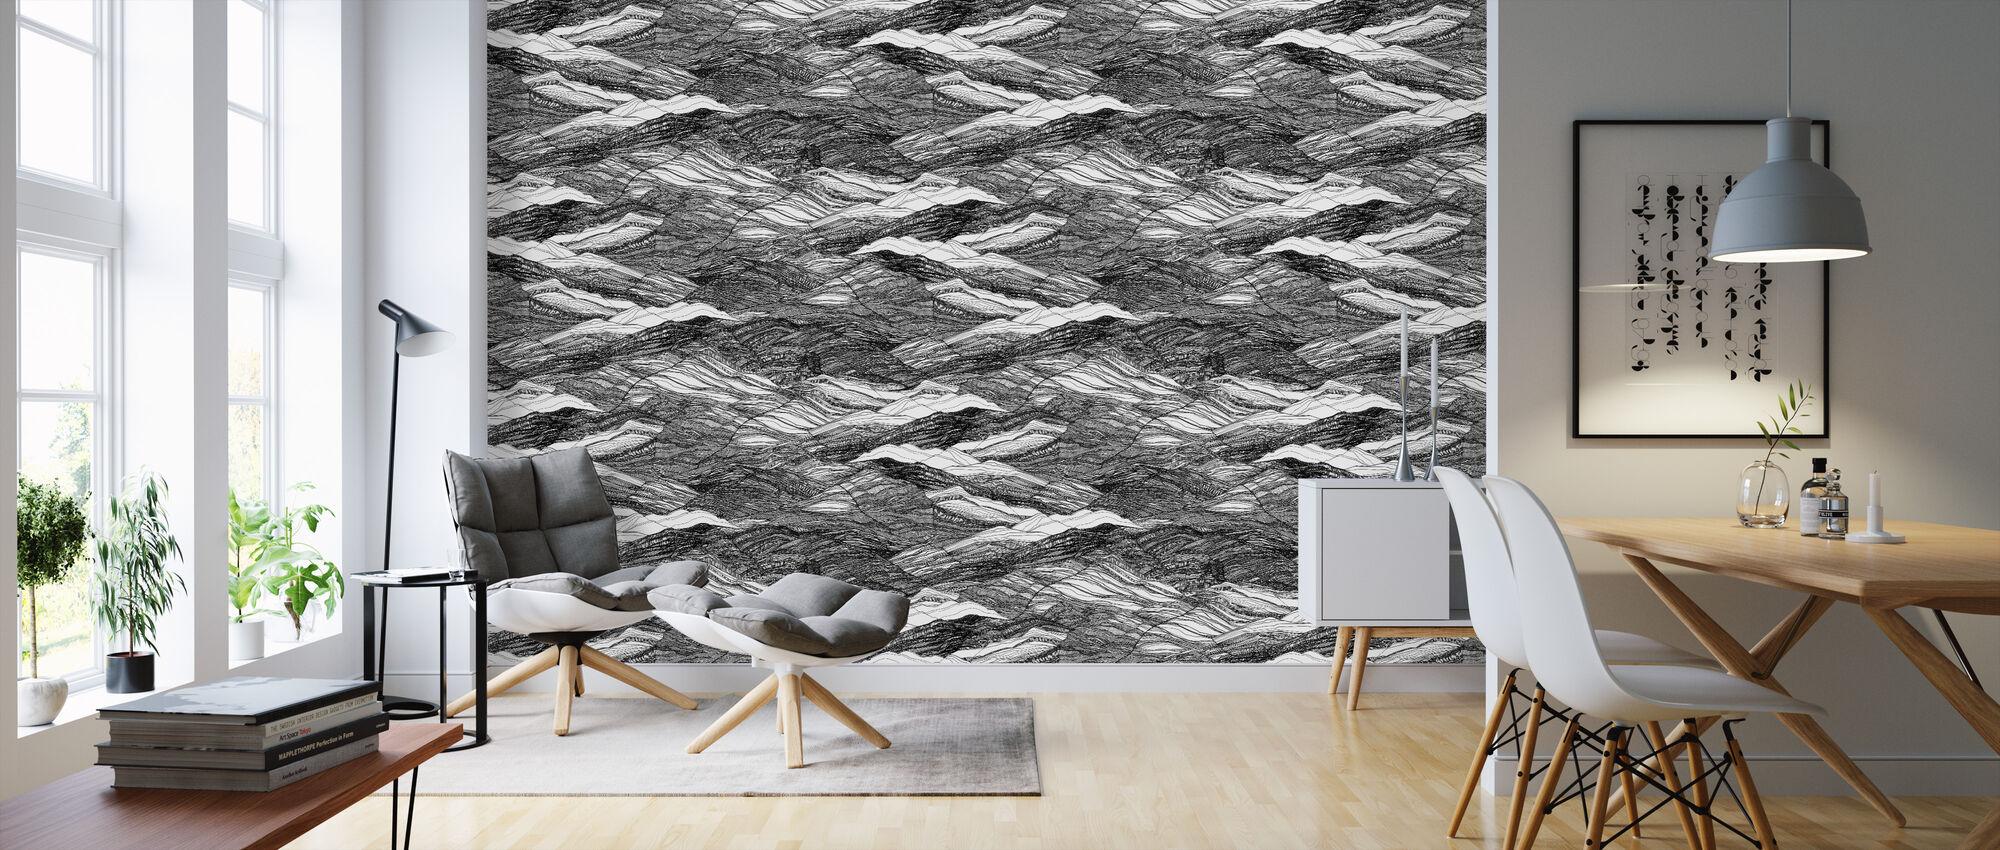 Duna Black Rock - Wallpaper - Living Room